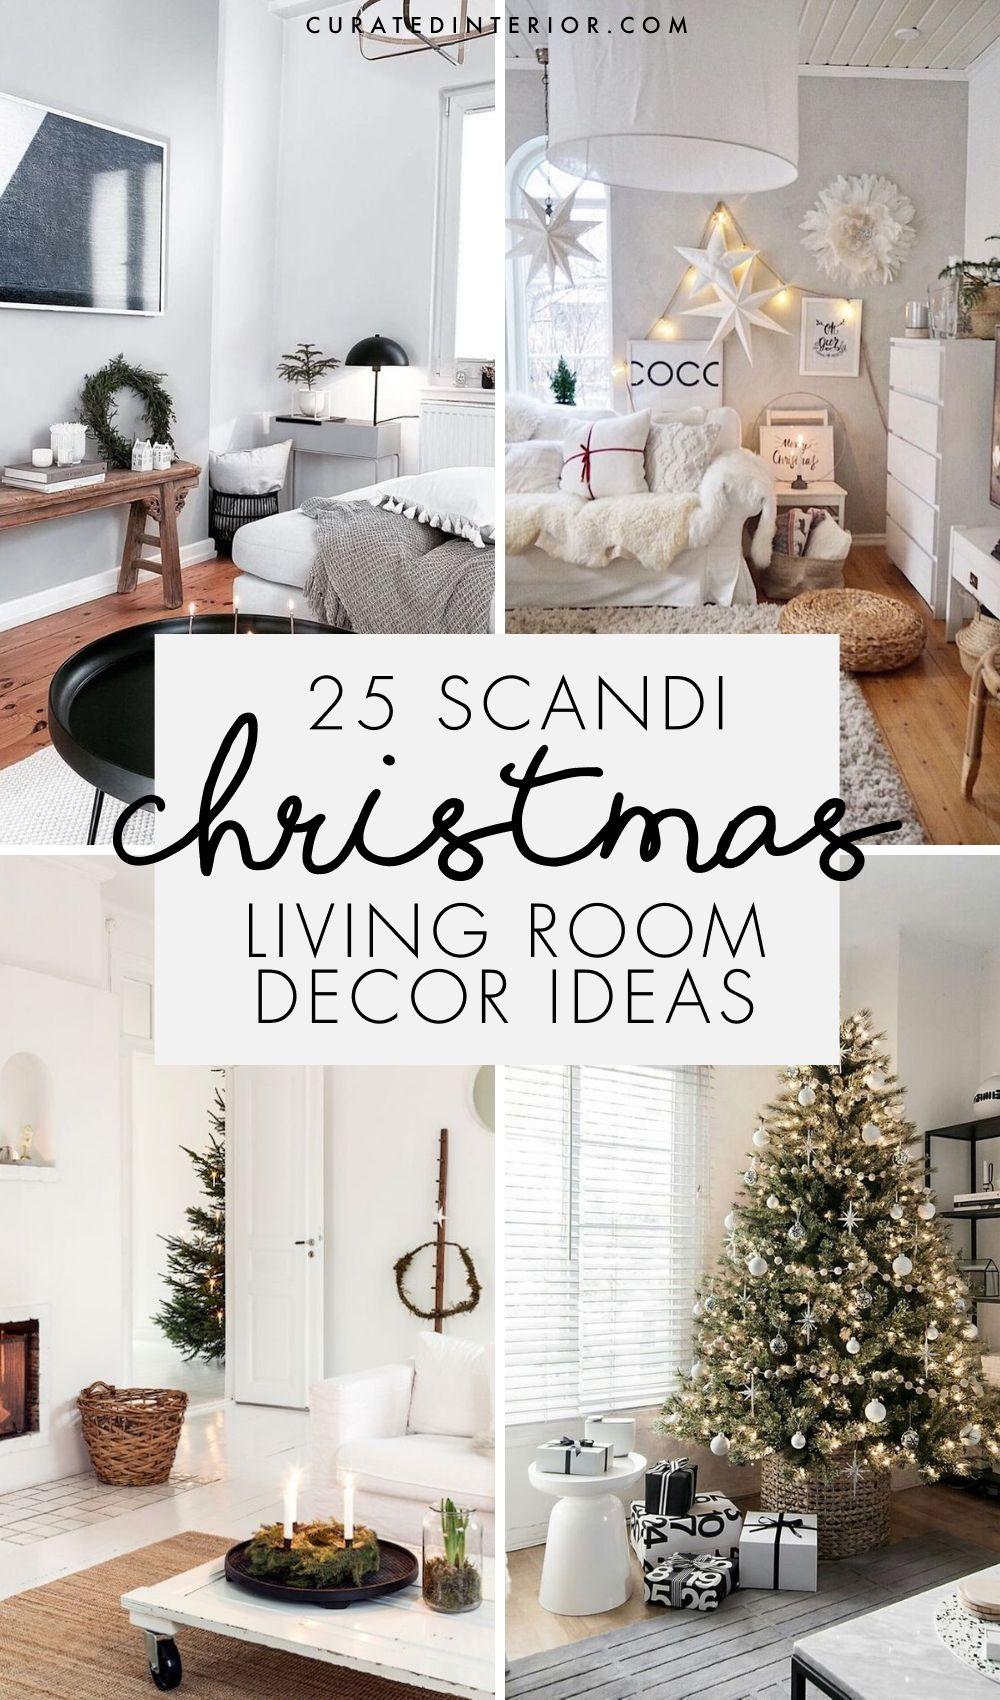 25 Scandi Christmas Living Room Decor Ideas